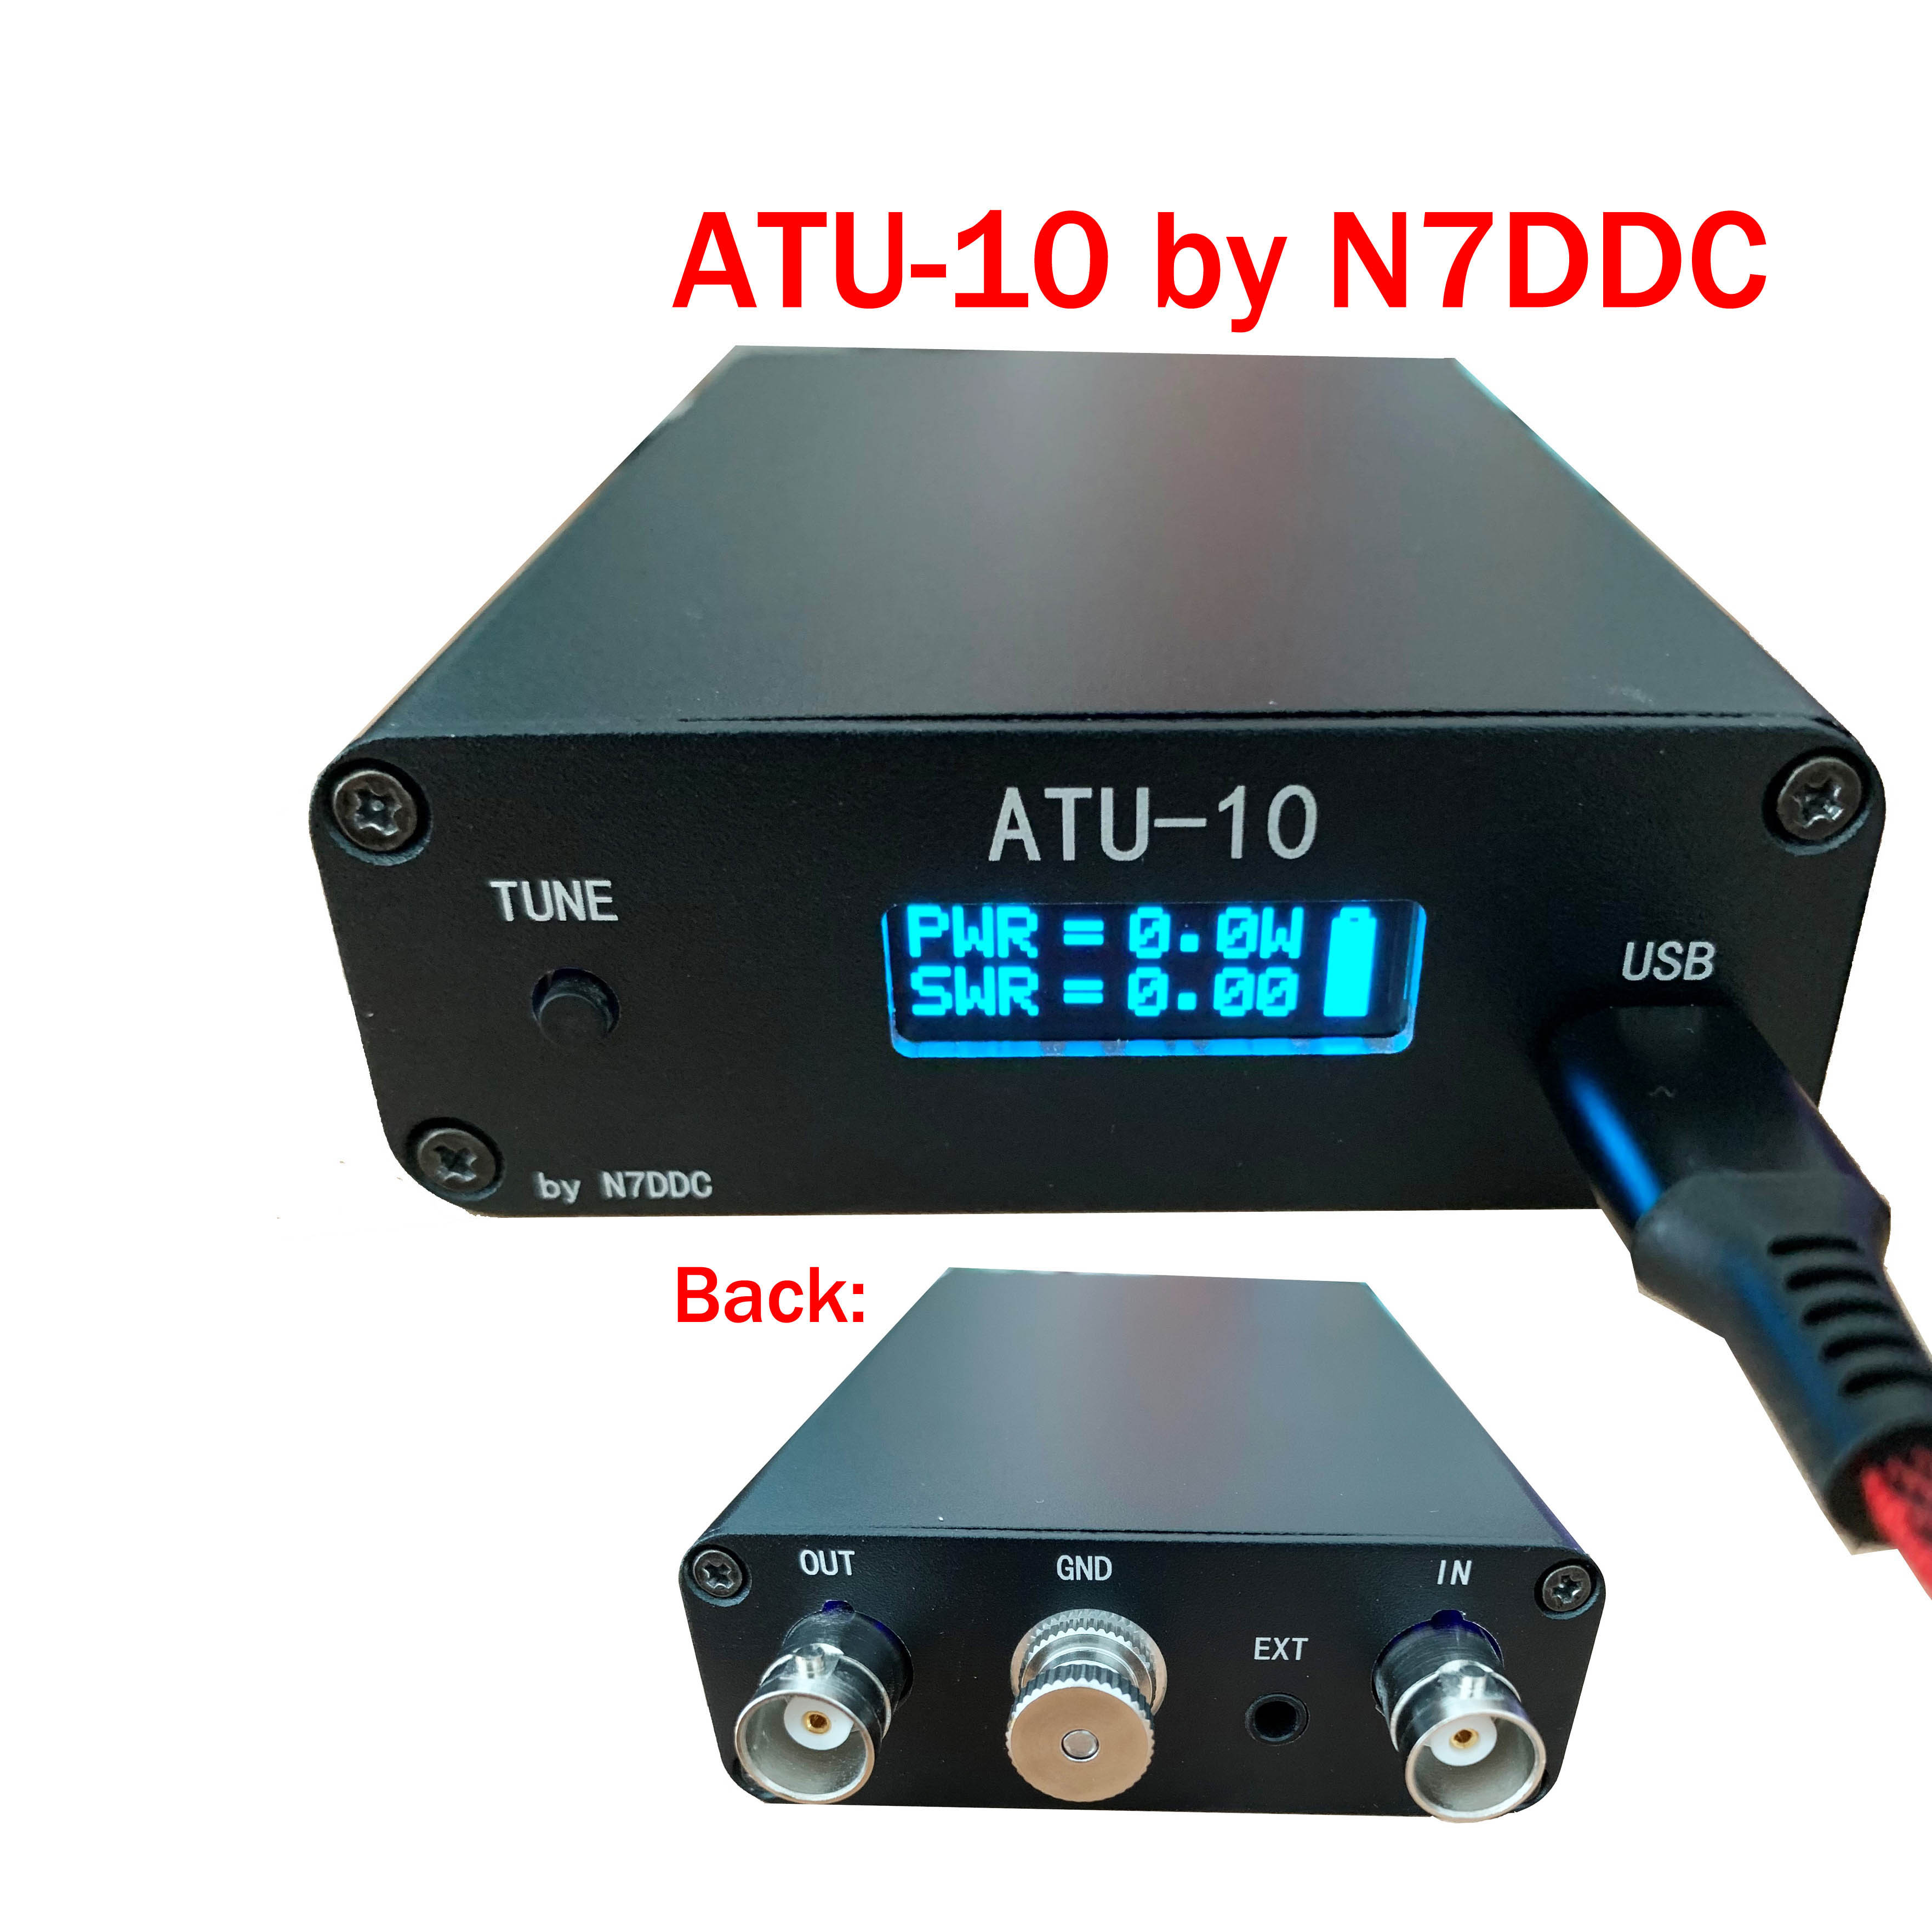 ATU-10 ATU10 QRP بواسطة N7DDC ATU-10 موالف هوائي أوتوماتيكي Tyny QRP